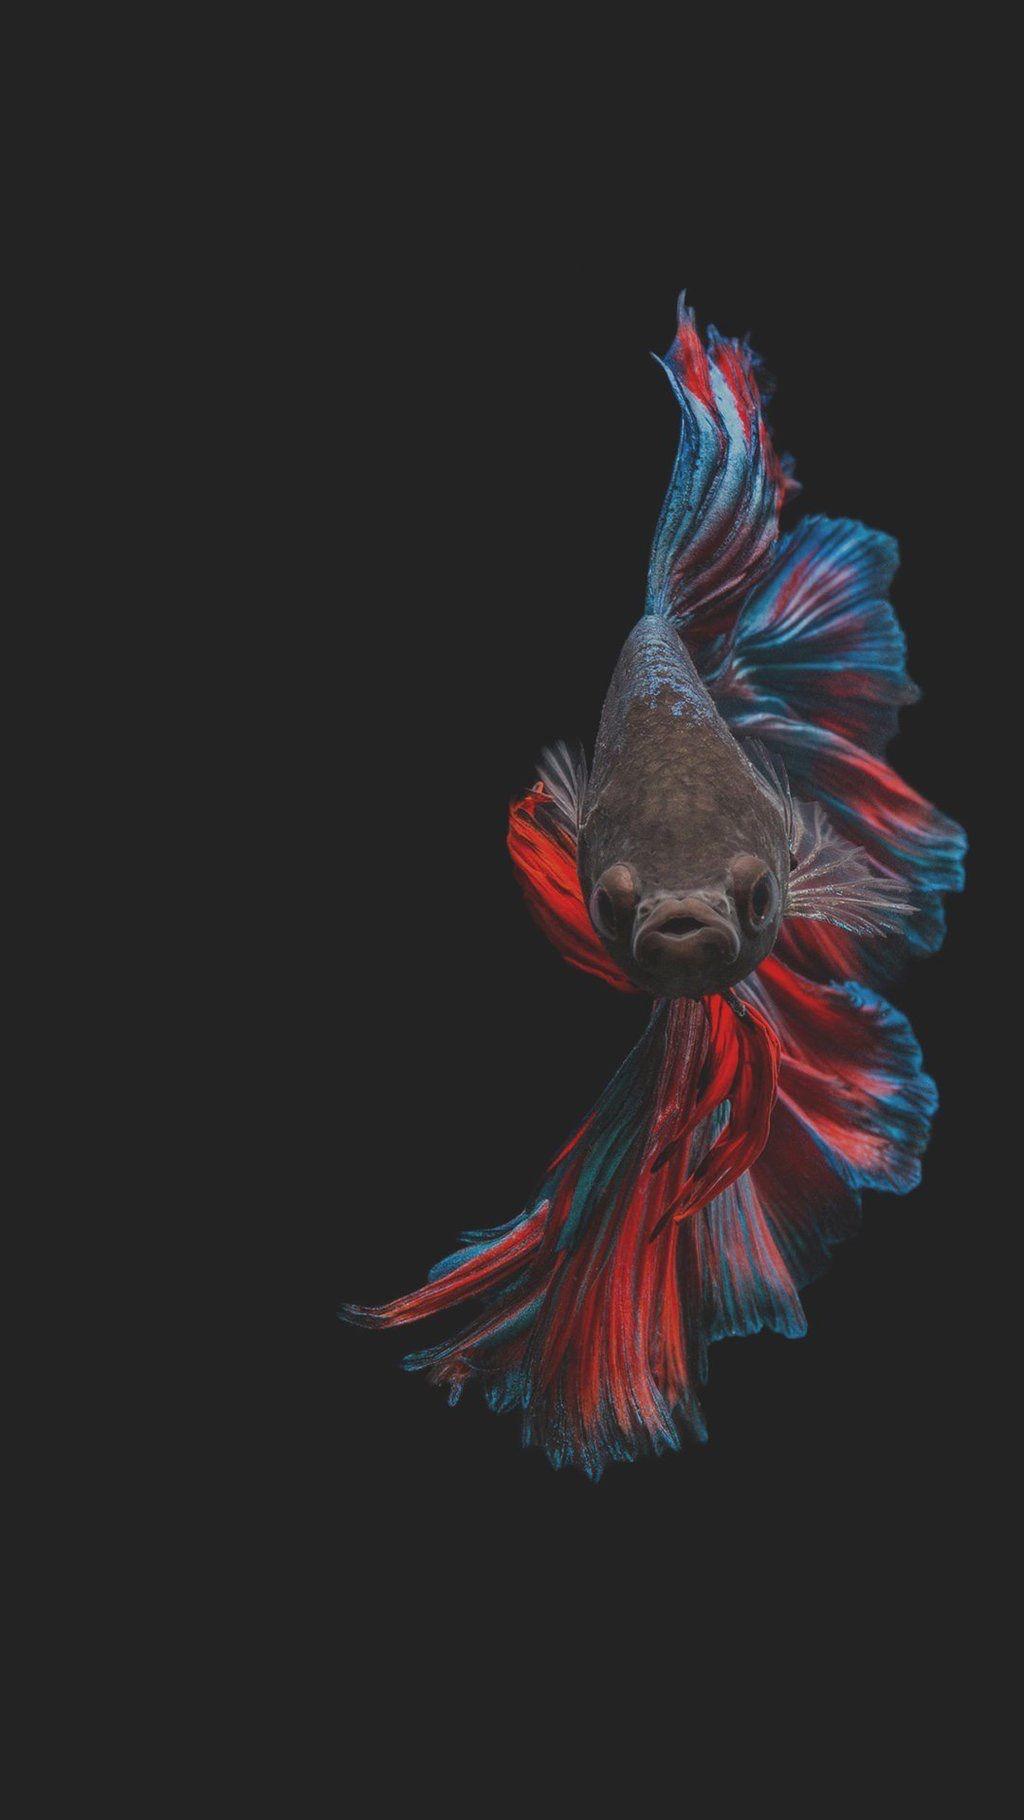 Pin Oleh Peler Andi Di Y Ikan Cupang Betta Hewan